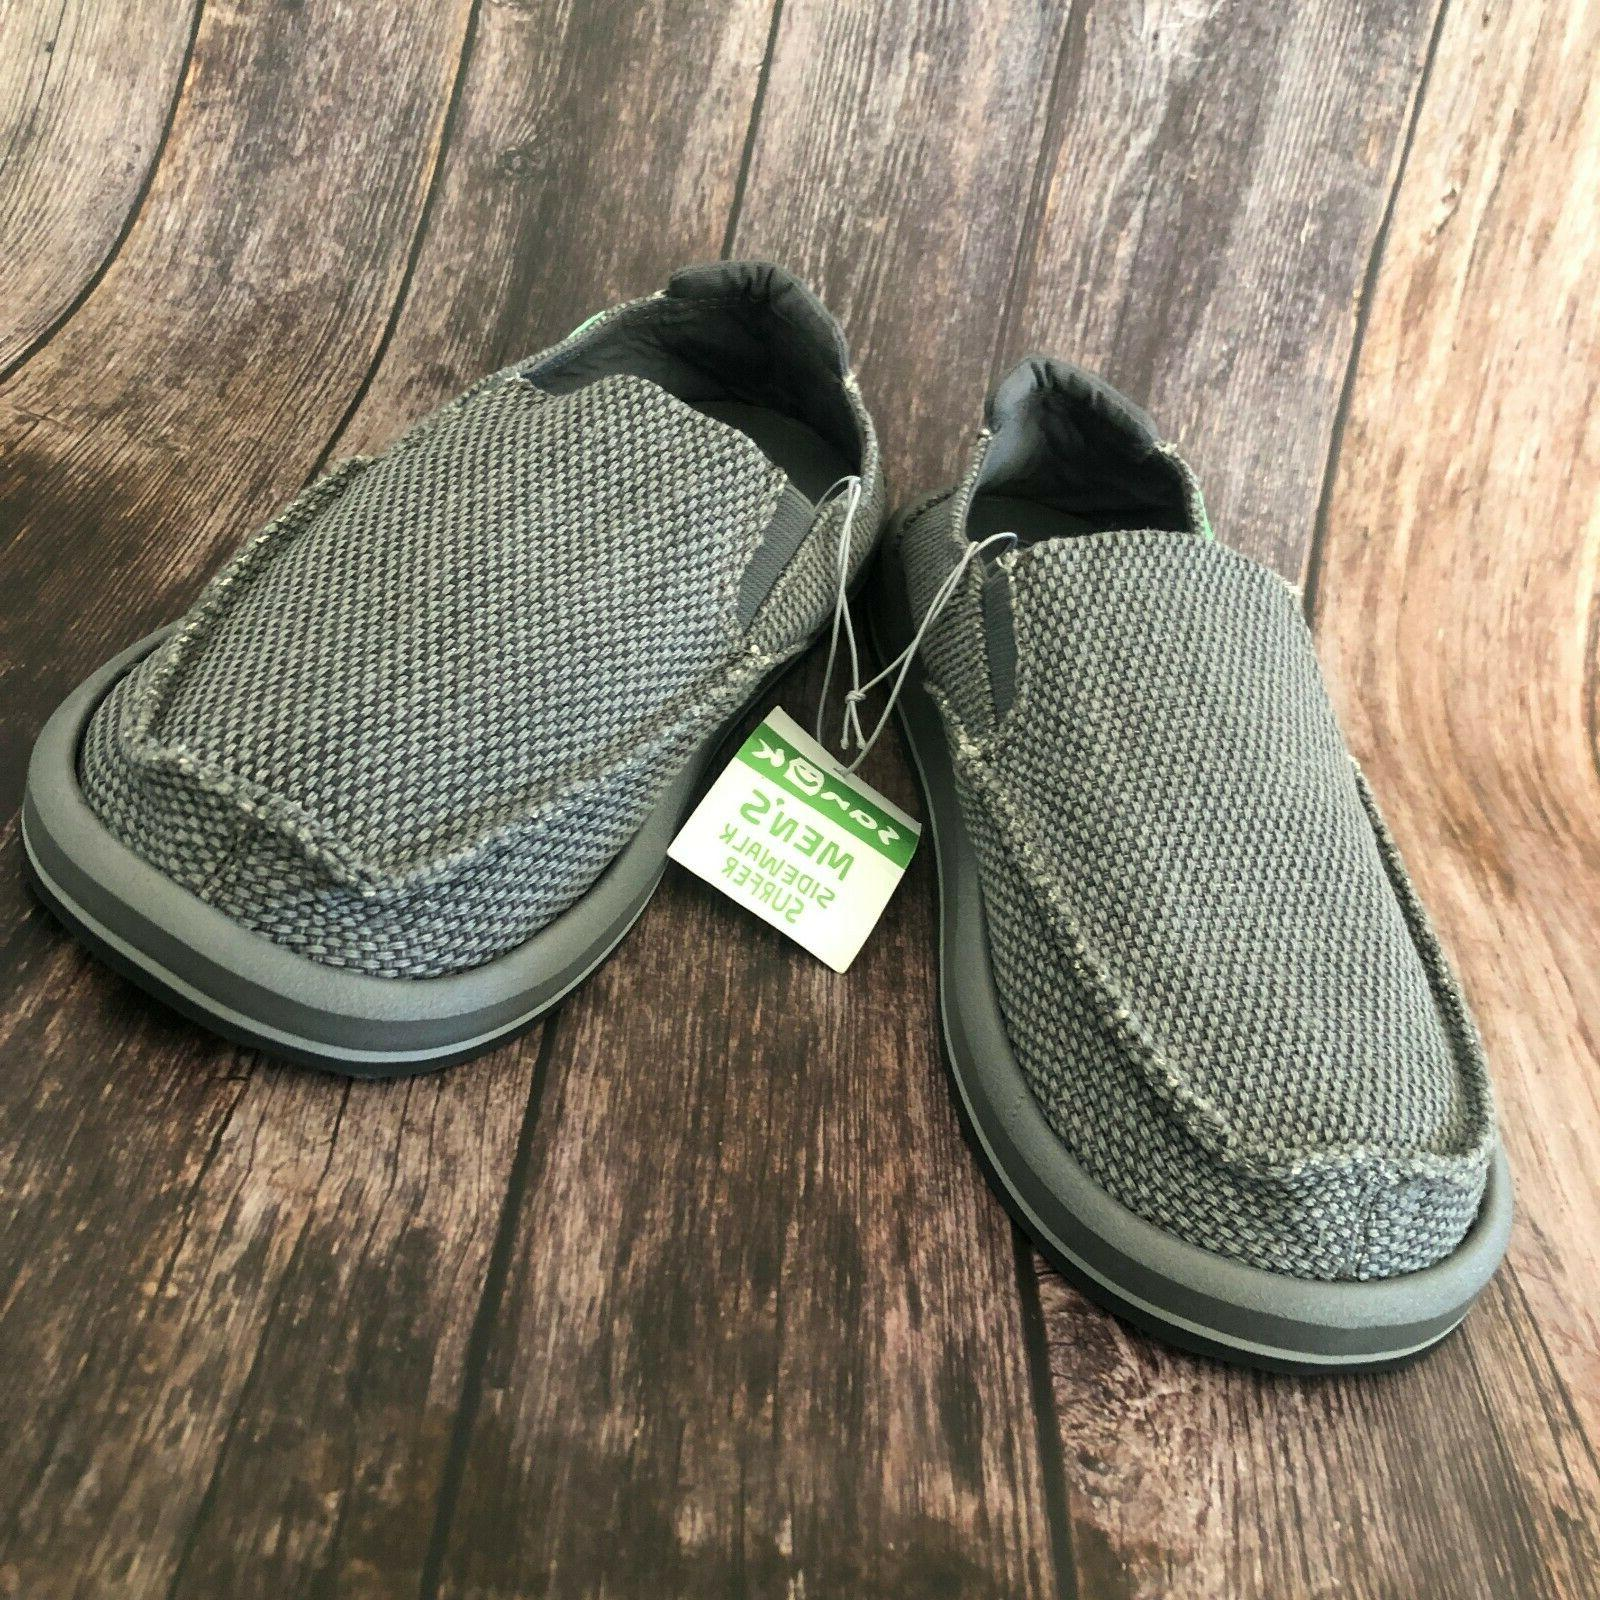 Sanuk Men's Loafers Surfer - Grey - Select Size